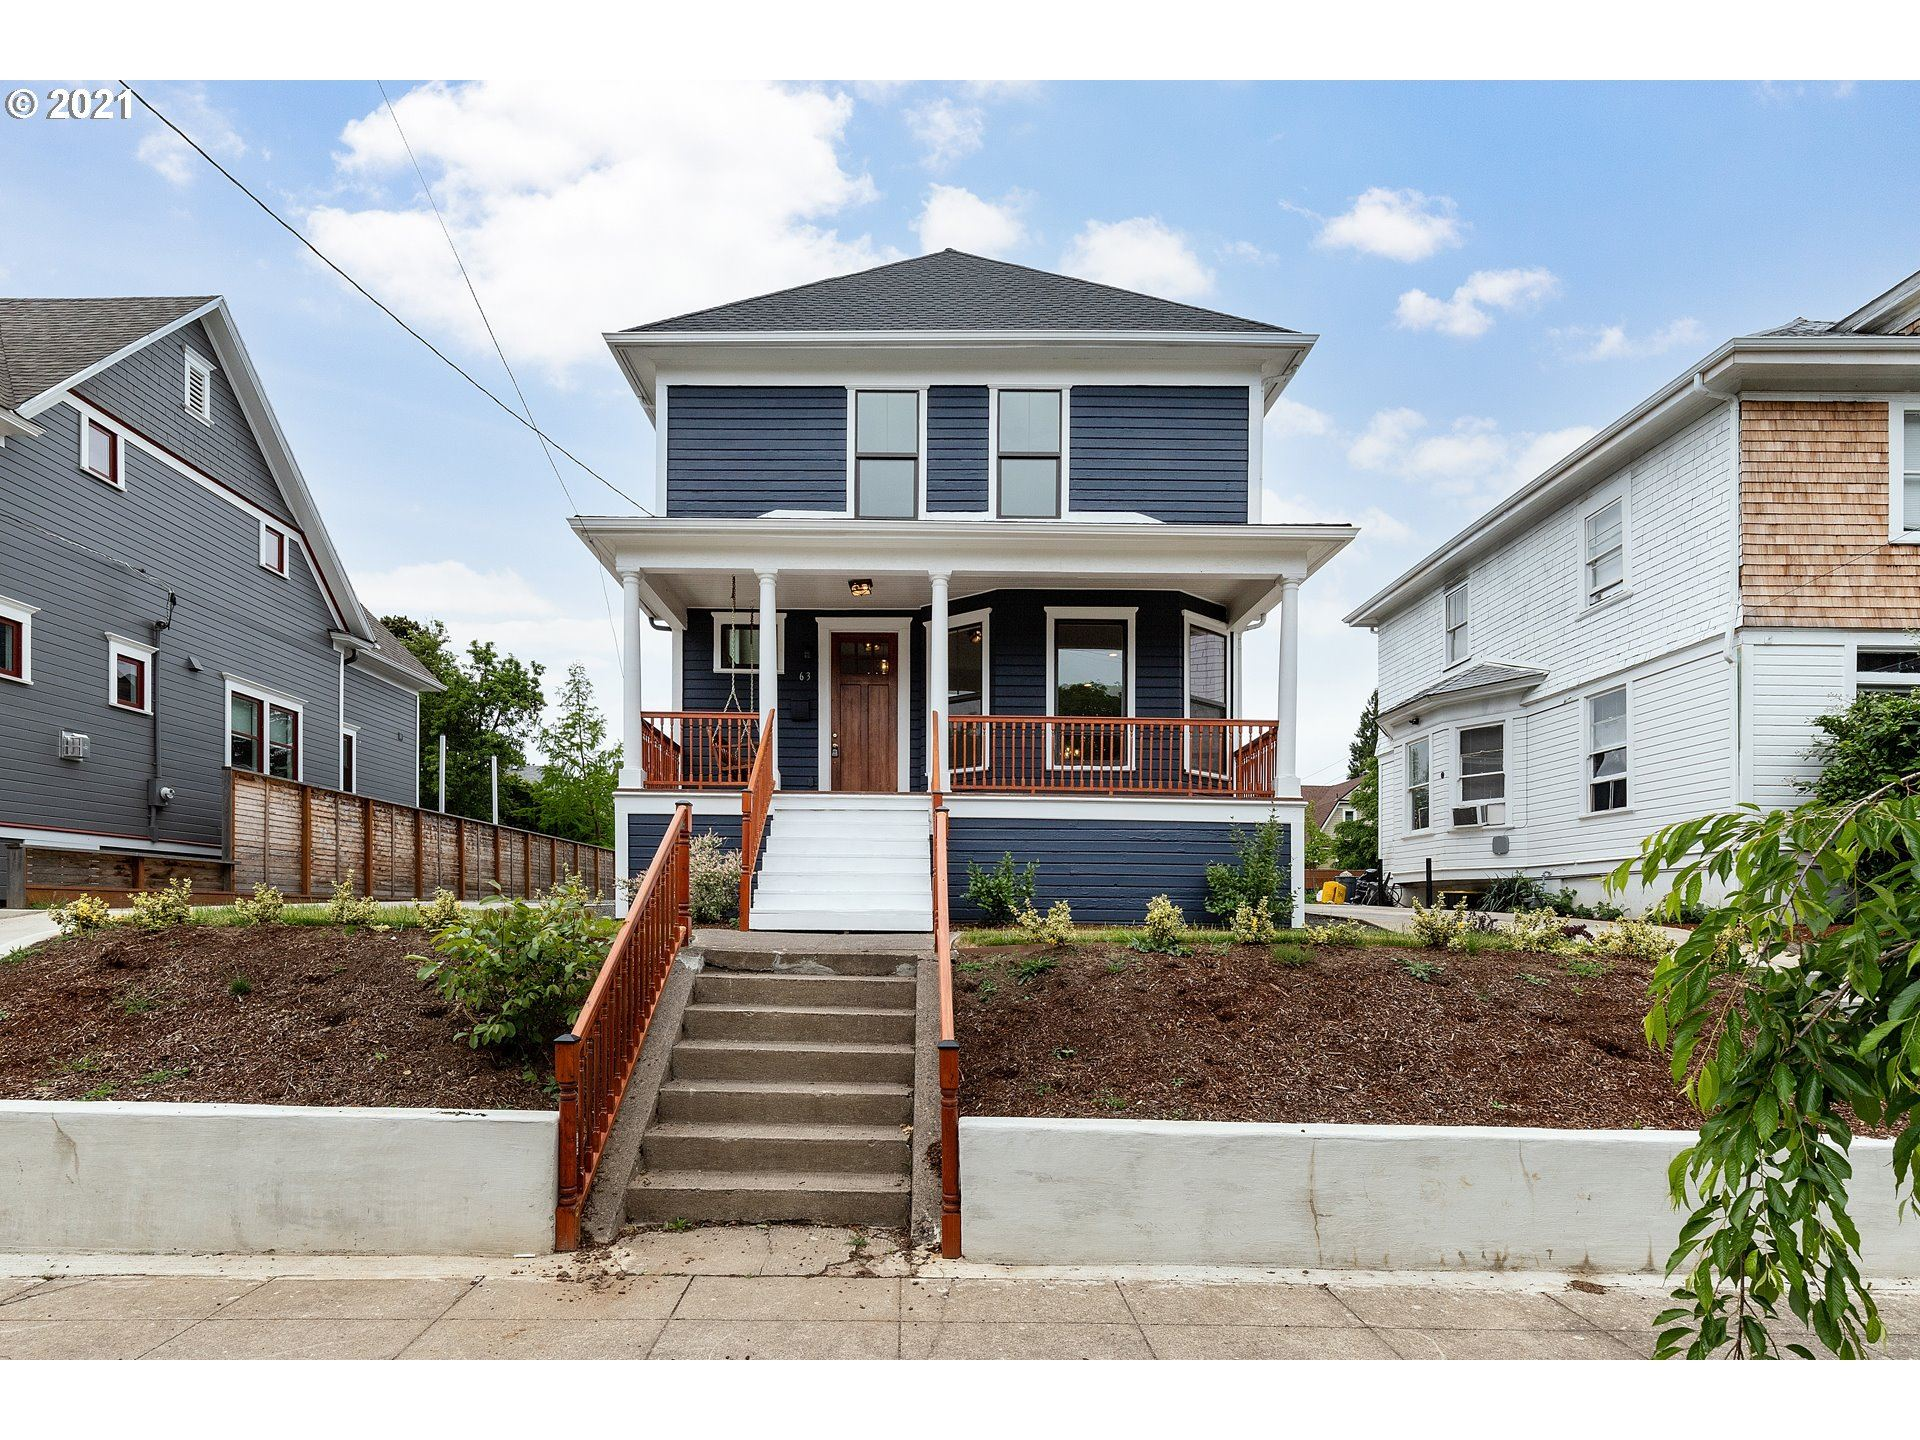 63 NE MORRIS ST, Portland, OR 97212 - MLS#: 21487640